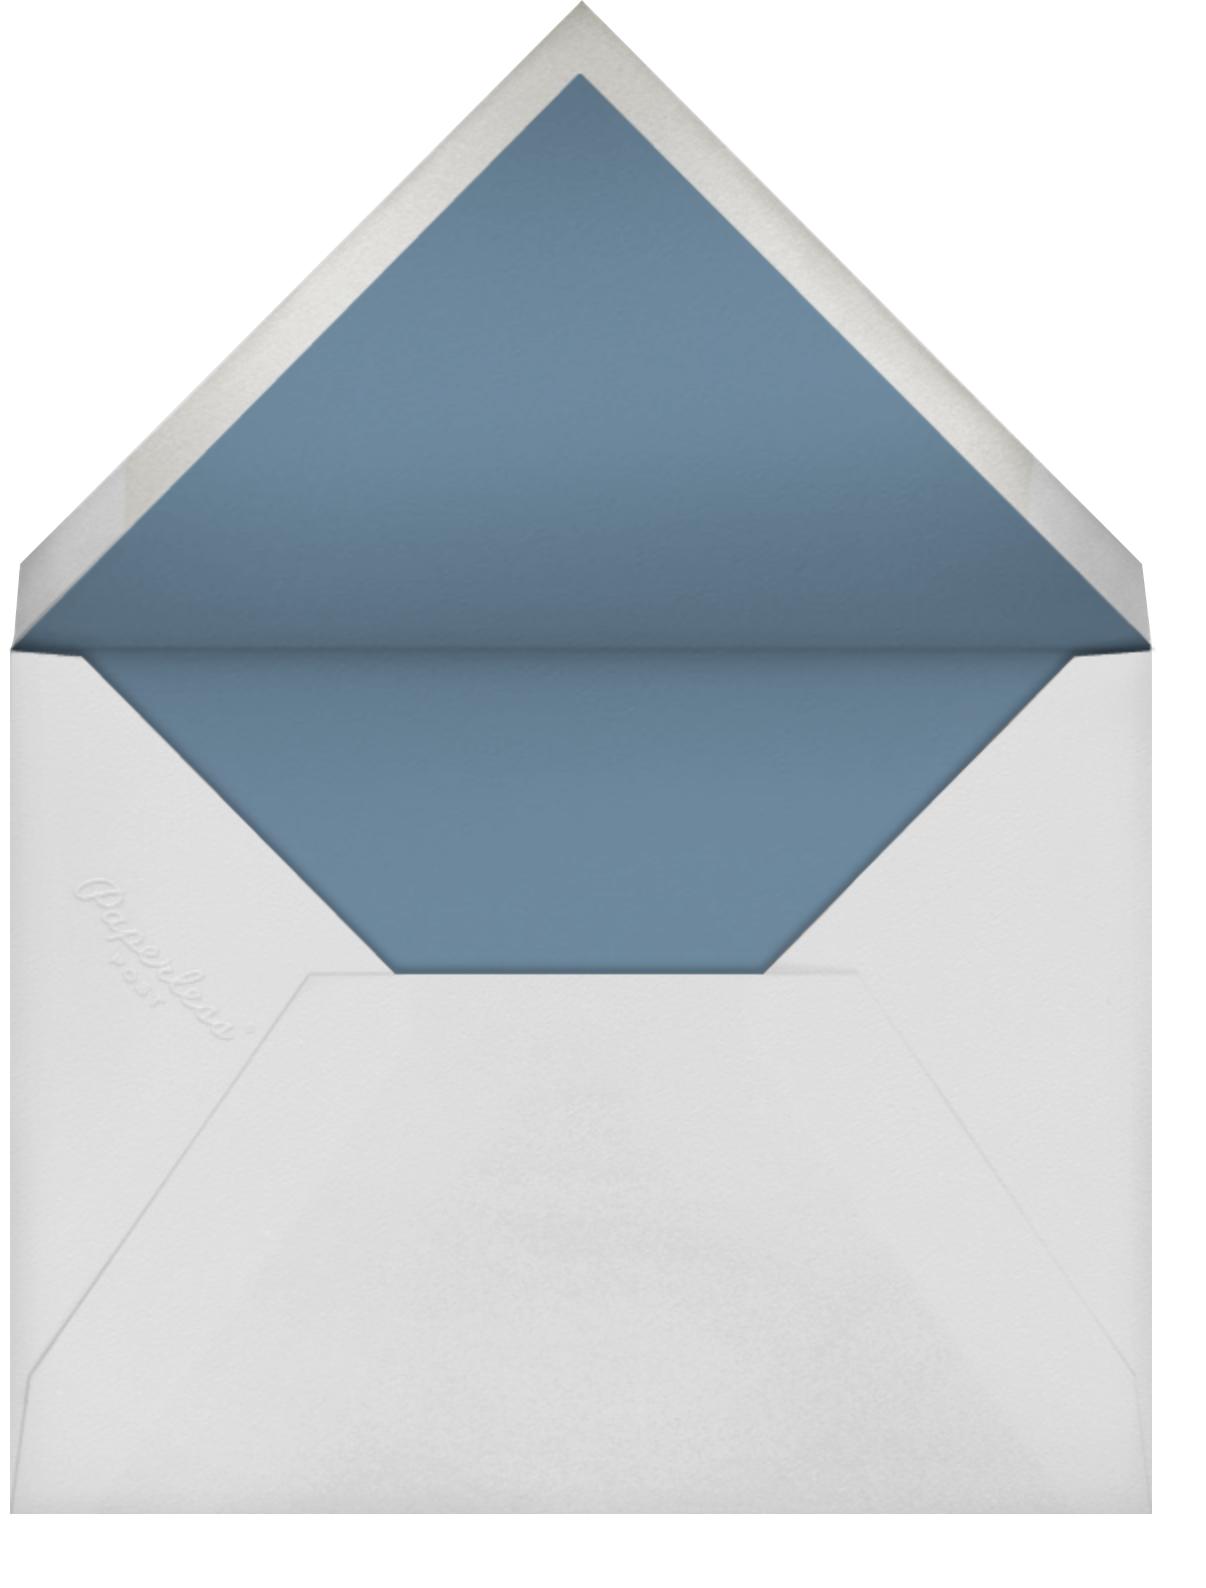 Toile Arabesque - Oscar de la Renta - Adult birthday - envelope back